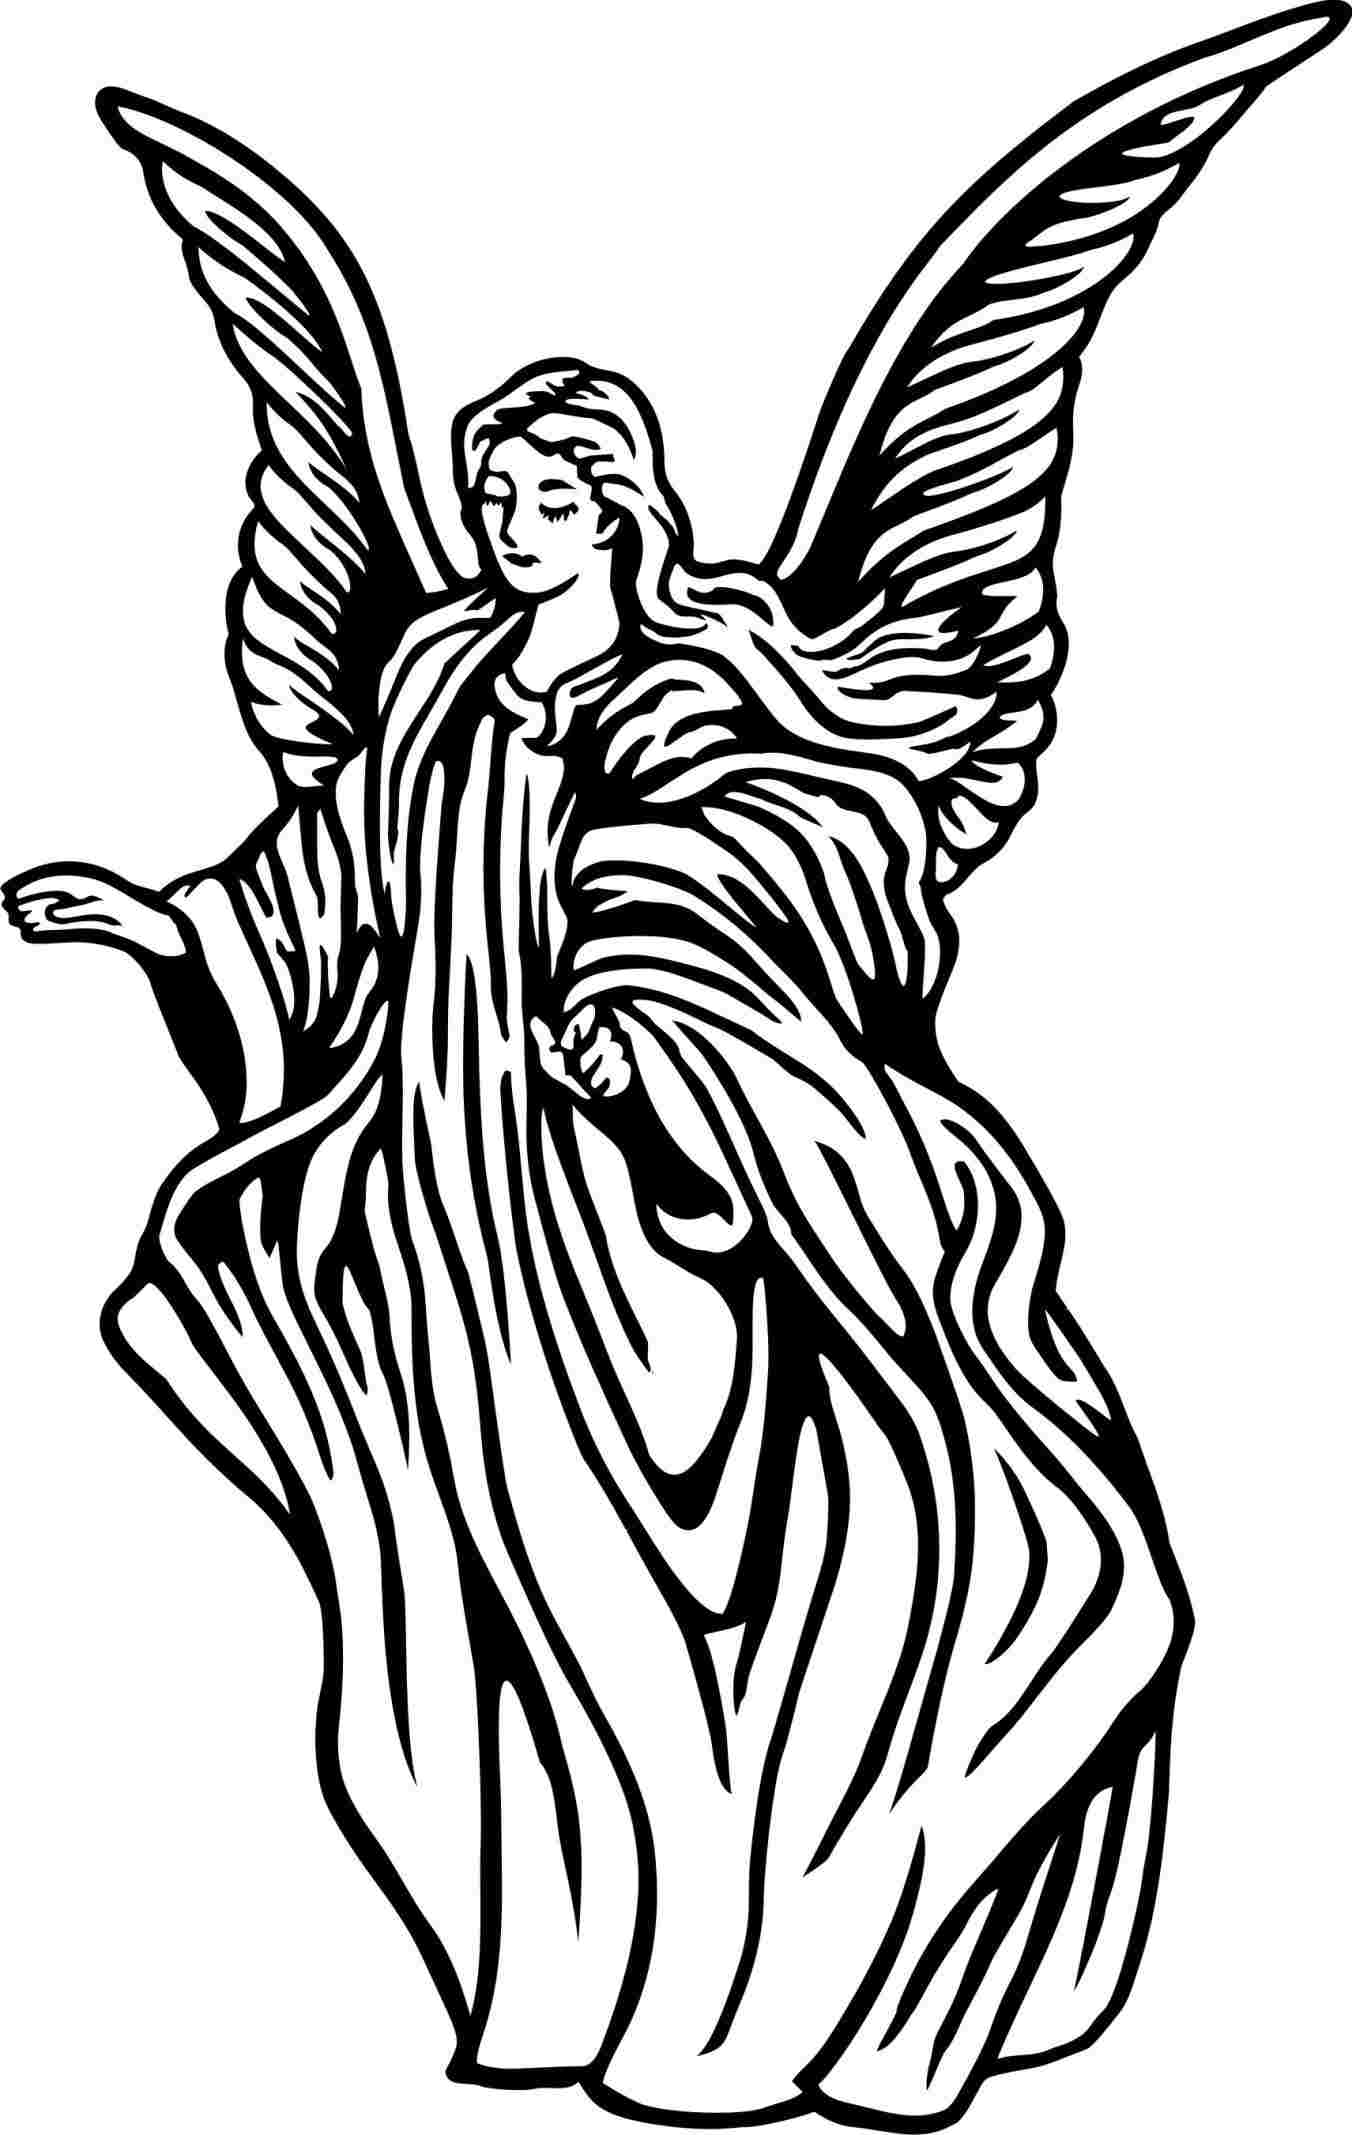 Pencil angel drawings free download best pencil angel